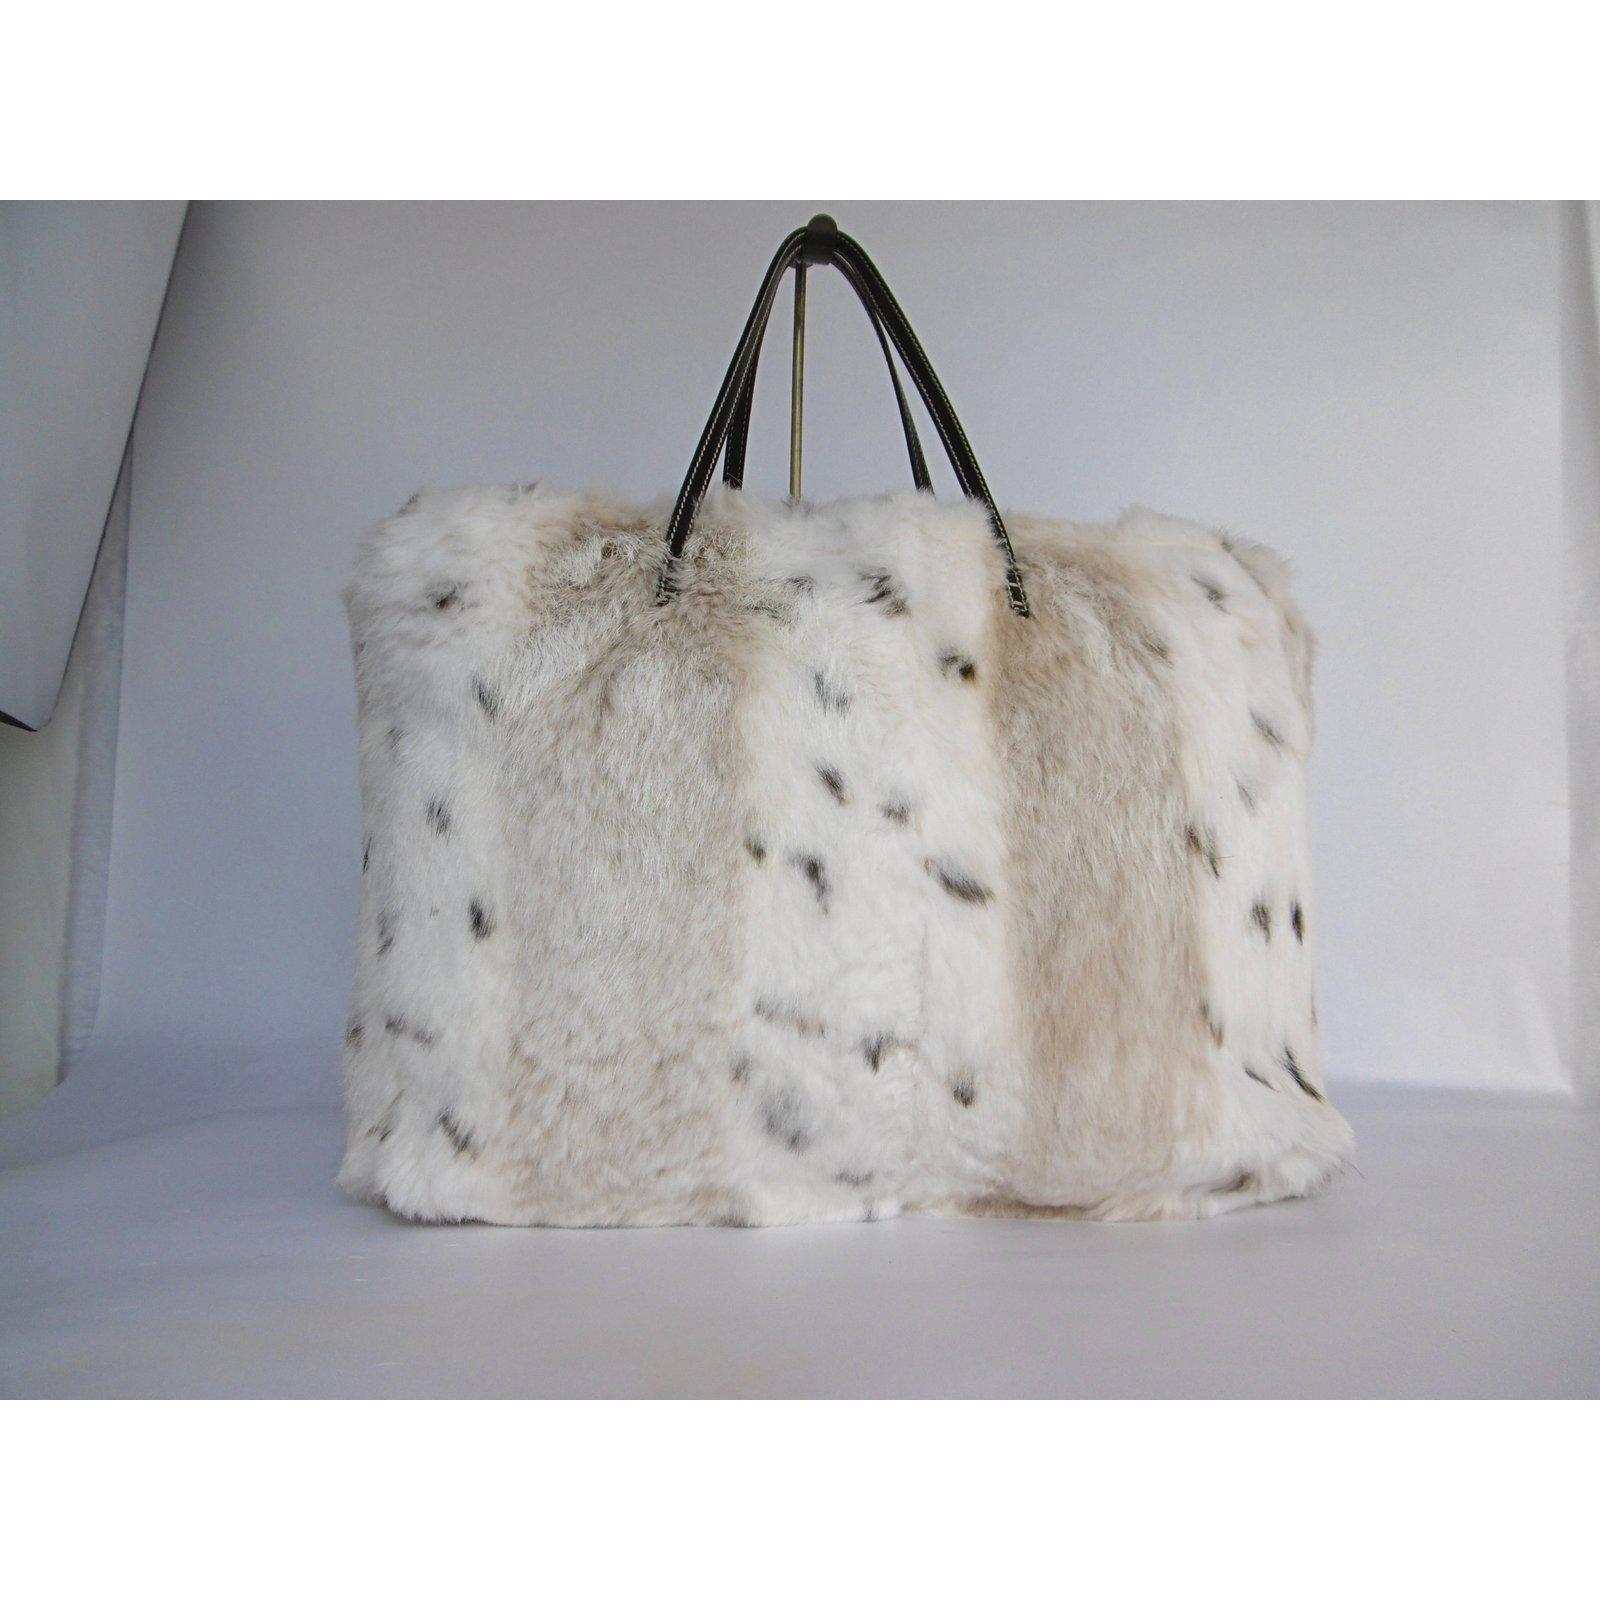 d56d5058c6b Fendi Fendi Fur Tote Bag Handbags Leather,Fur Multiple colors ref.83512 - Joli  Closet